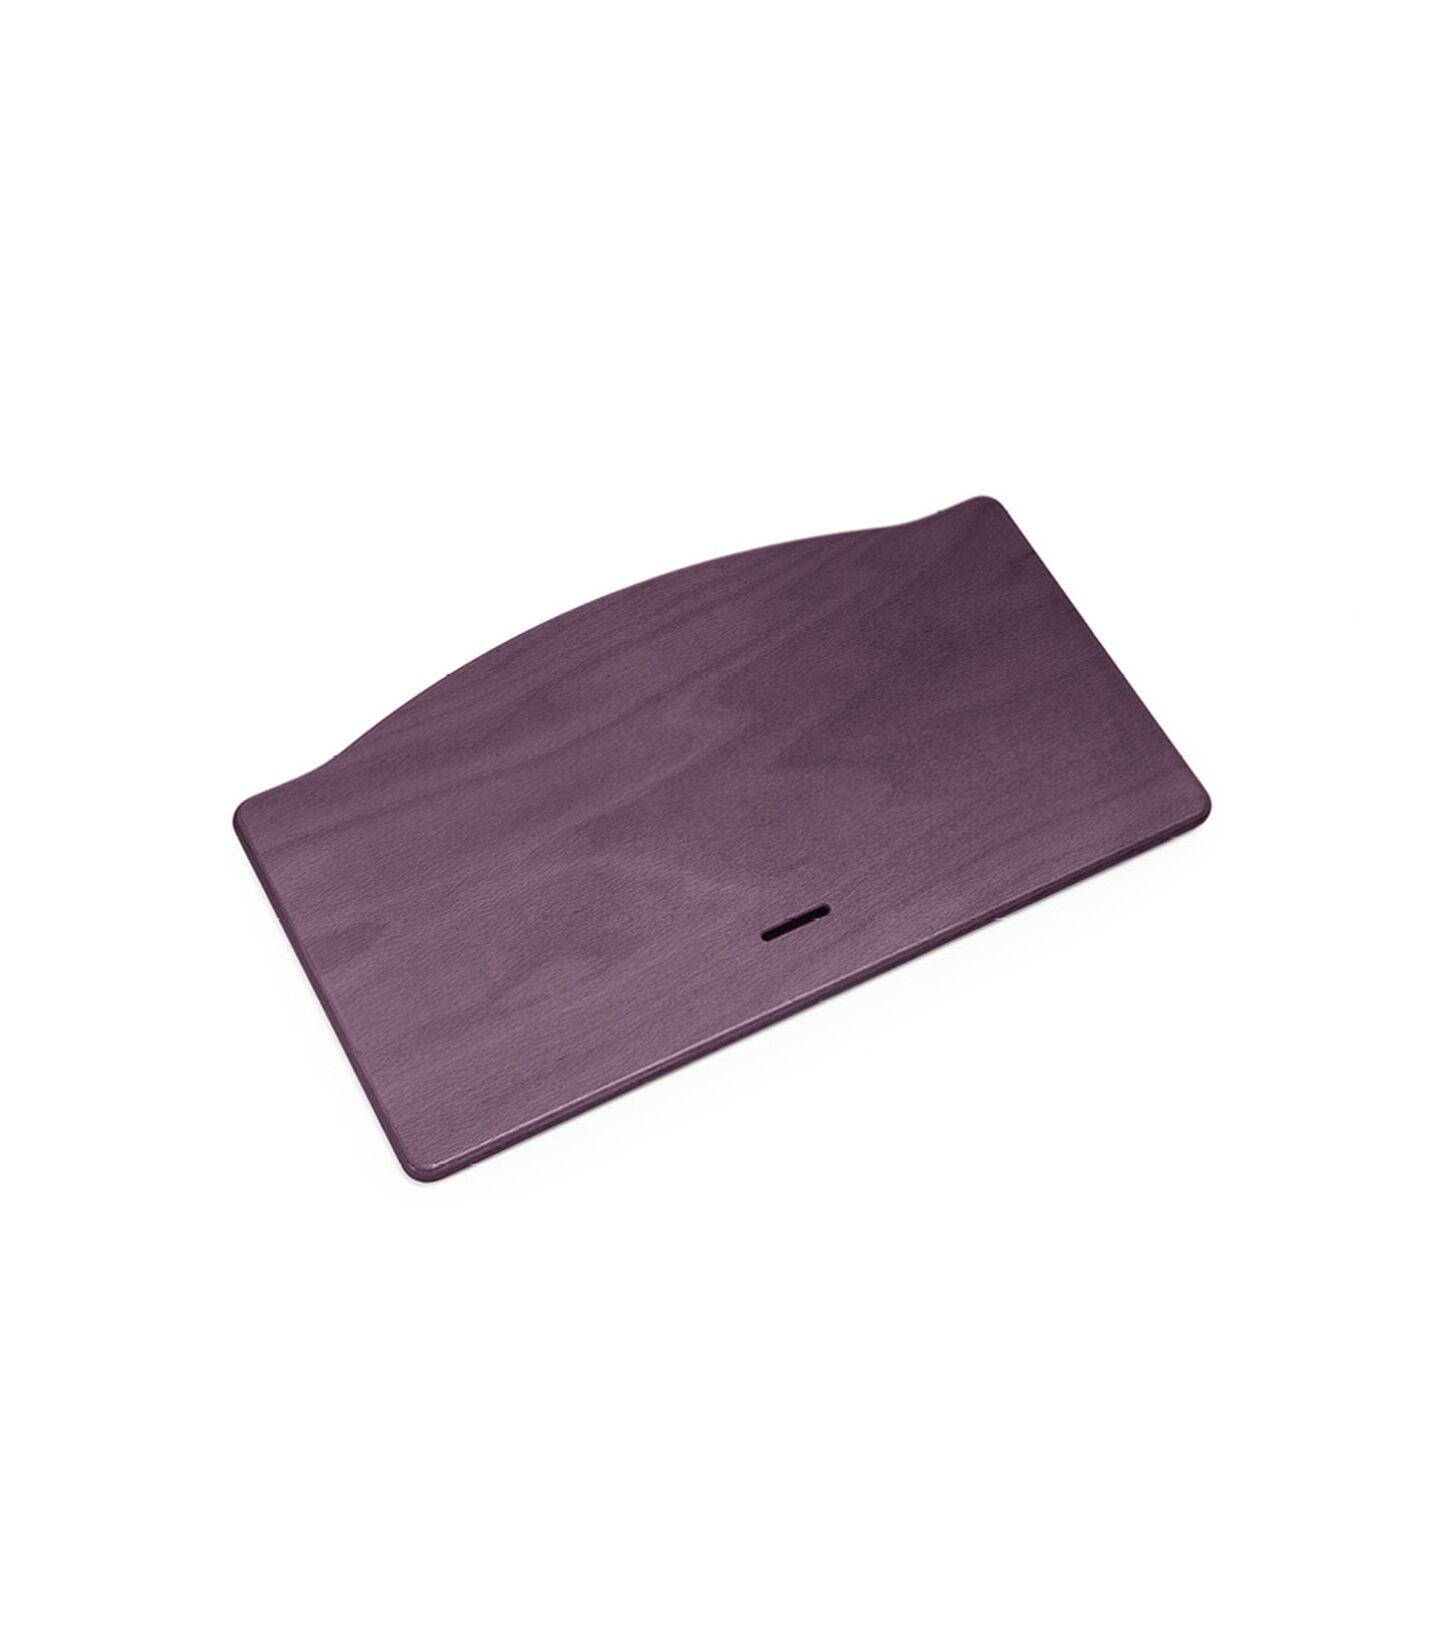 Tripp Trapp® Seatplate Plum Purple, Prune, mainview view 2